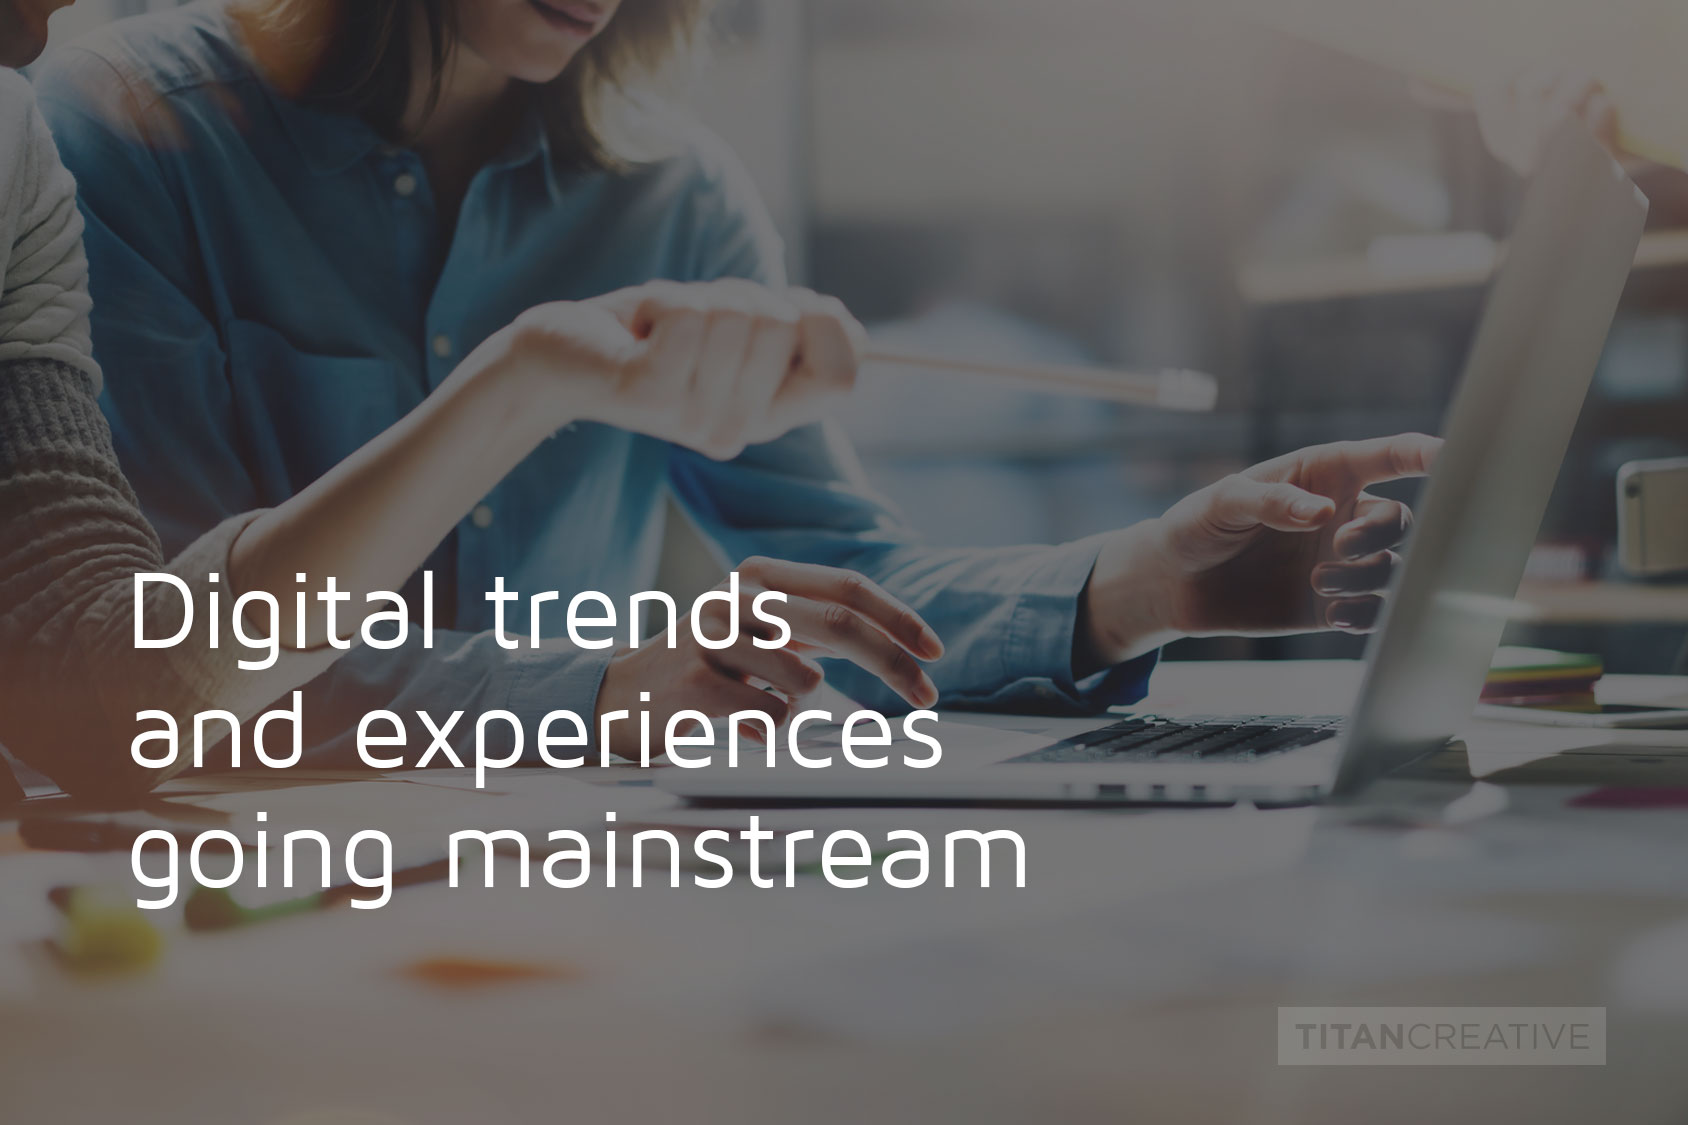 Digital experiences & trends going mainstream.